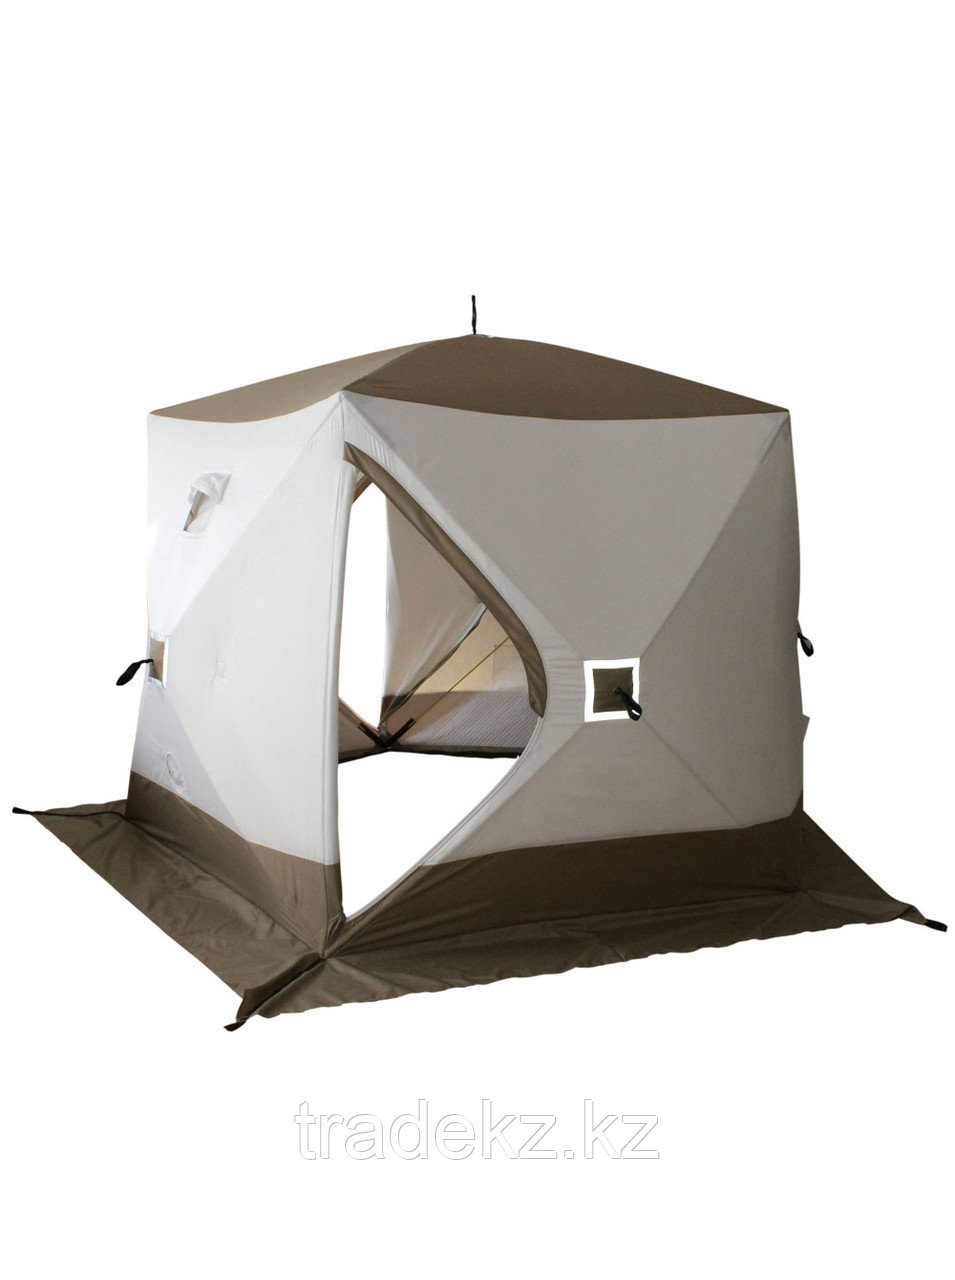 "Палатка для зимней рыбалки PF-TW-15 СЛЕДОПЫТ ""Premium"" 5 стен (1,8х1,75 м)"